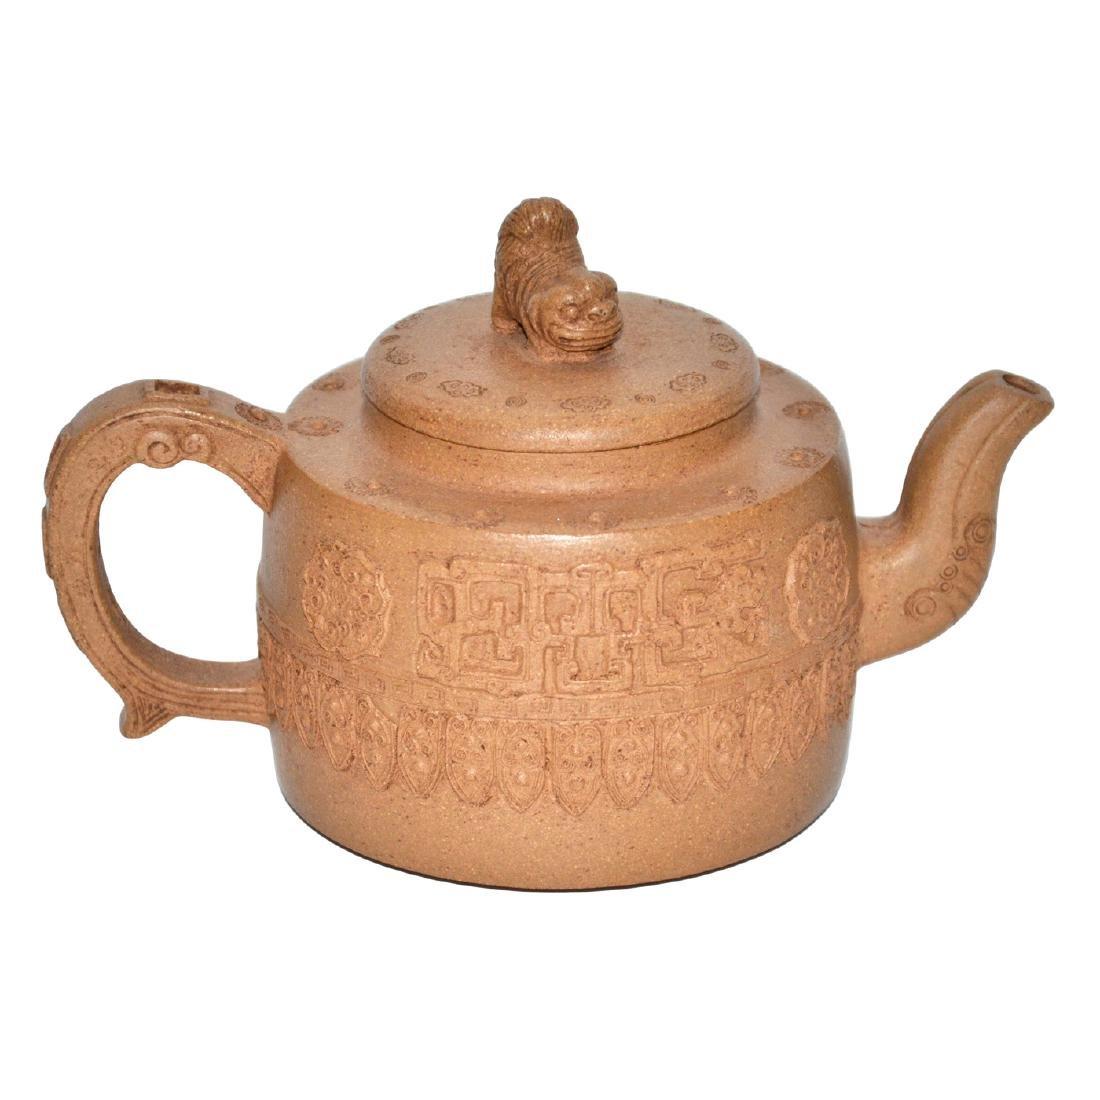 Wang Nanlin, Zisha Teapot with Molded Flowers and a